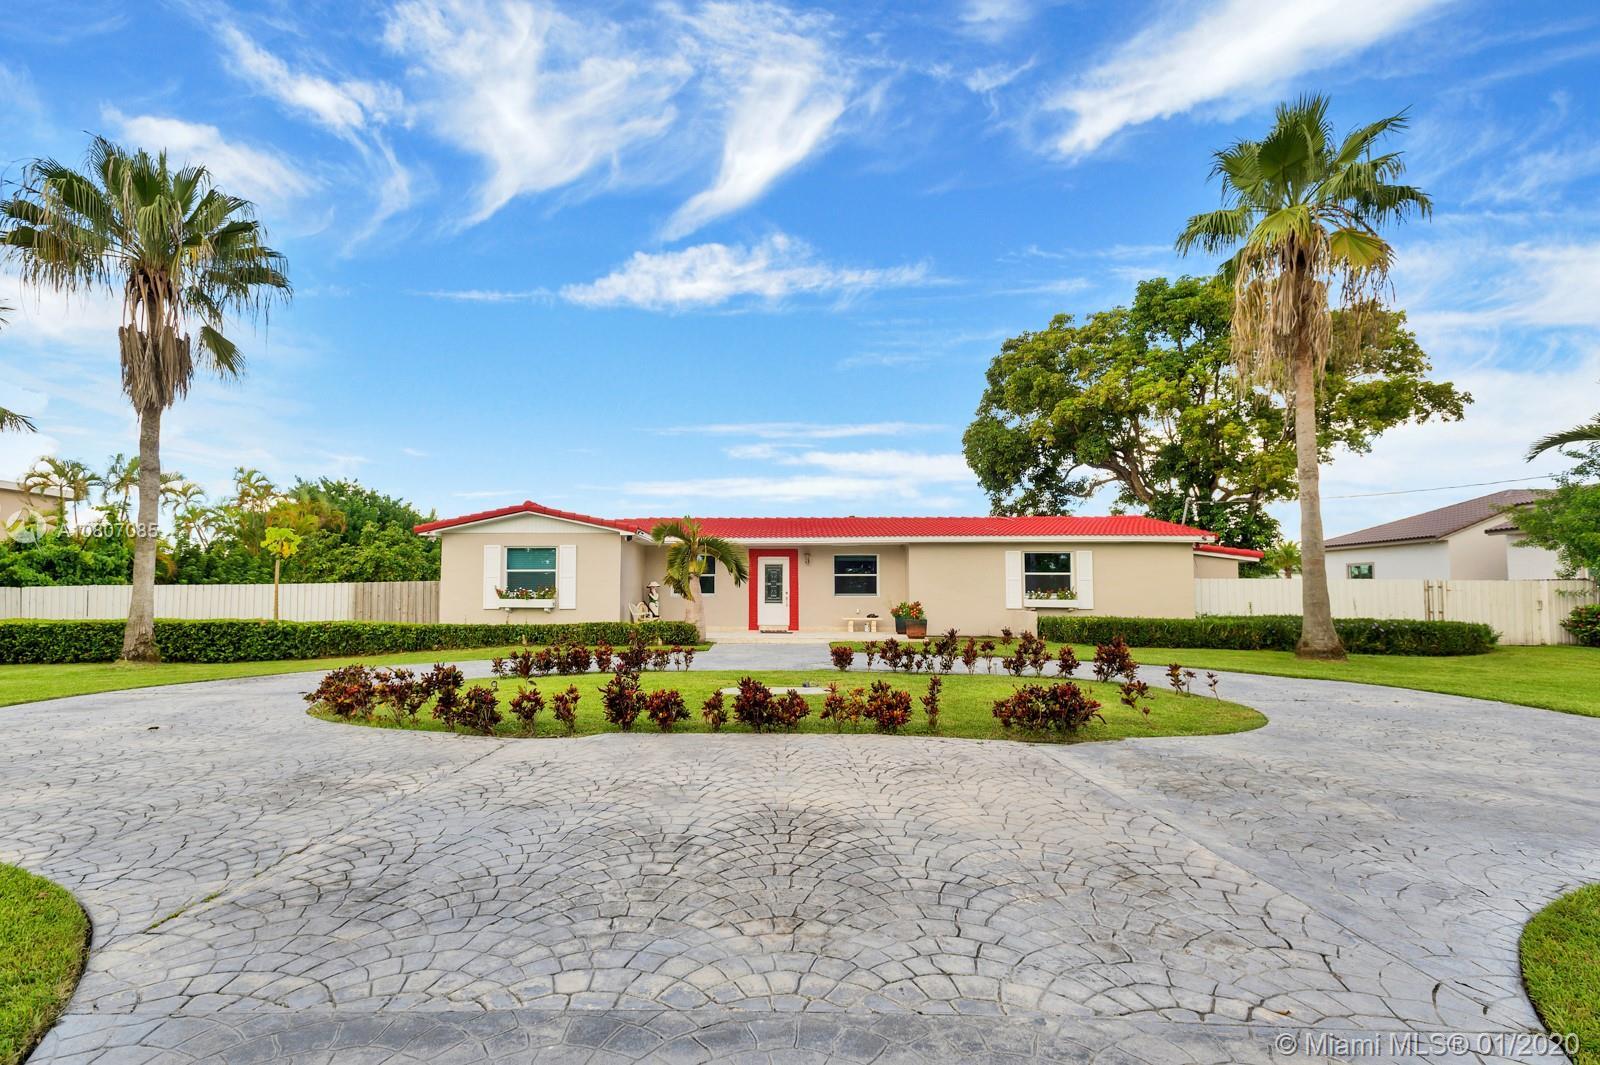 5350 SW 122nd Ave, Miami, FL 33175